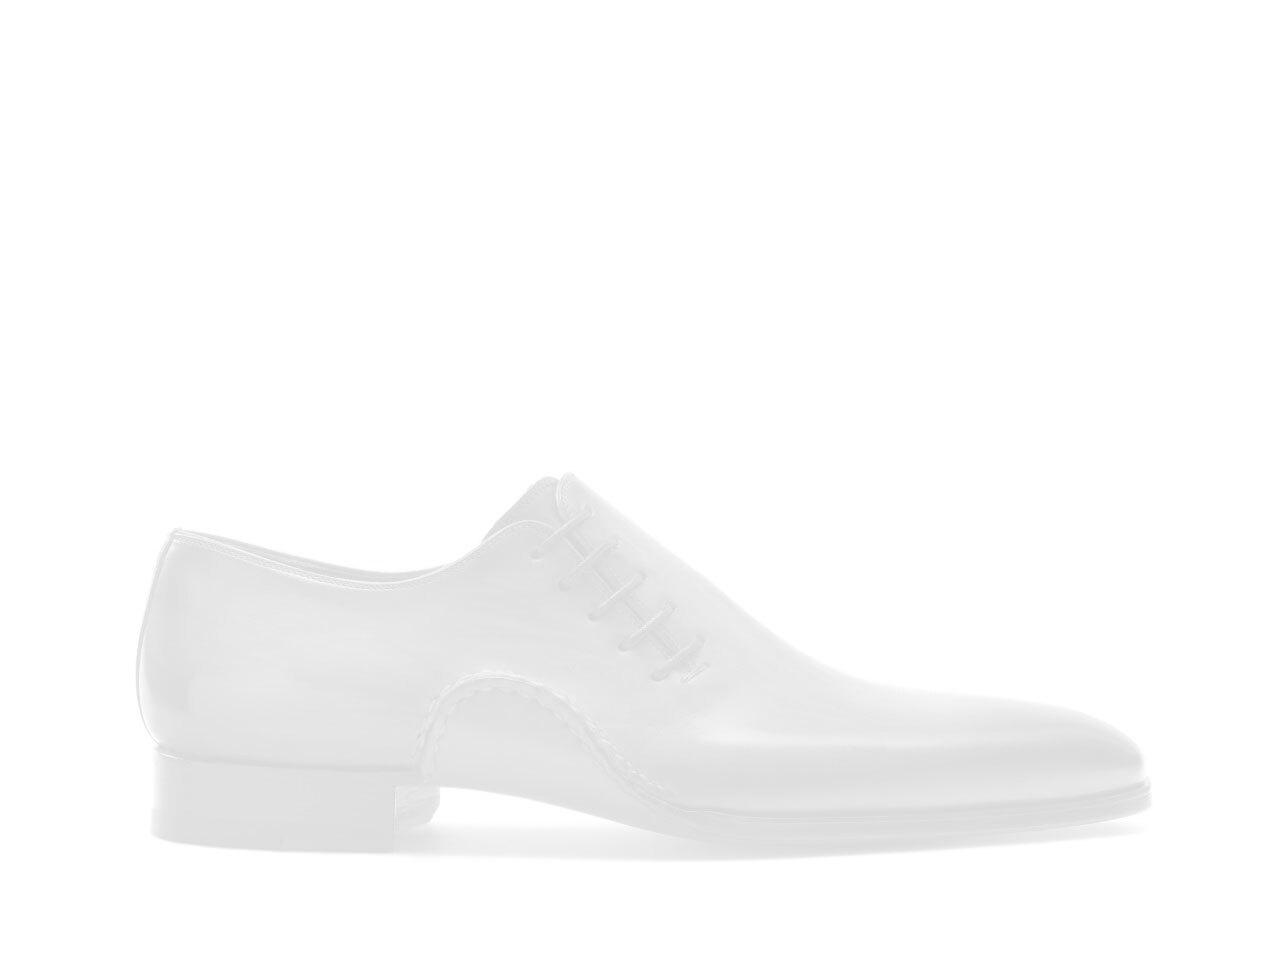 Sole of the Magnanni Deza Brown Men's Double Monk Strap Shoes